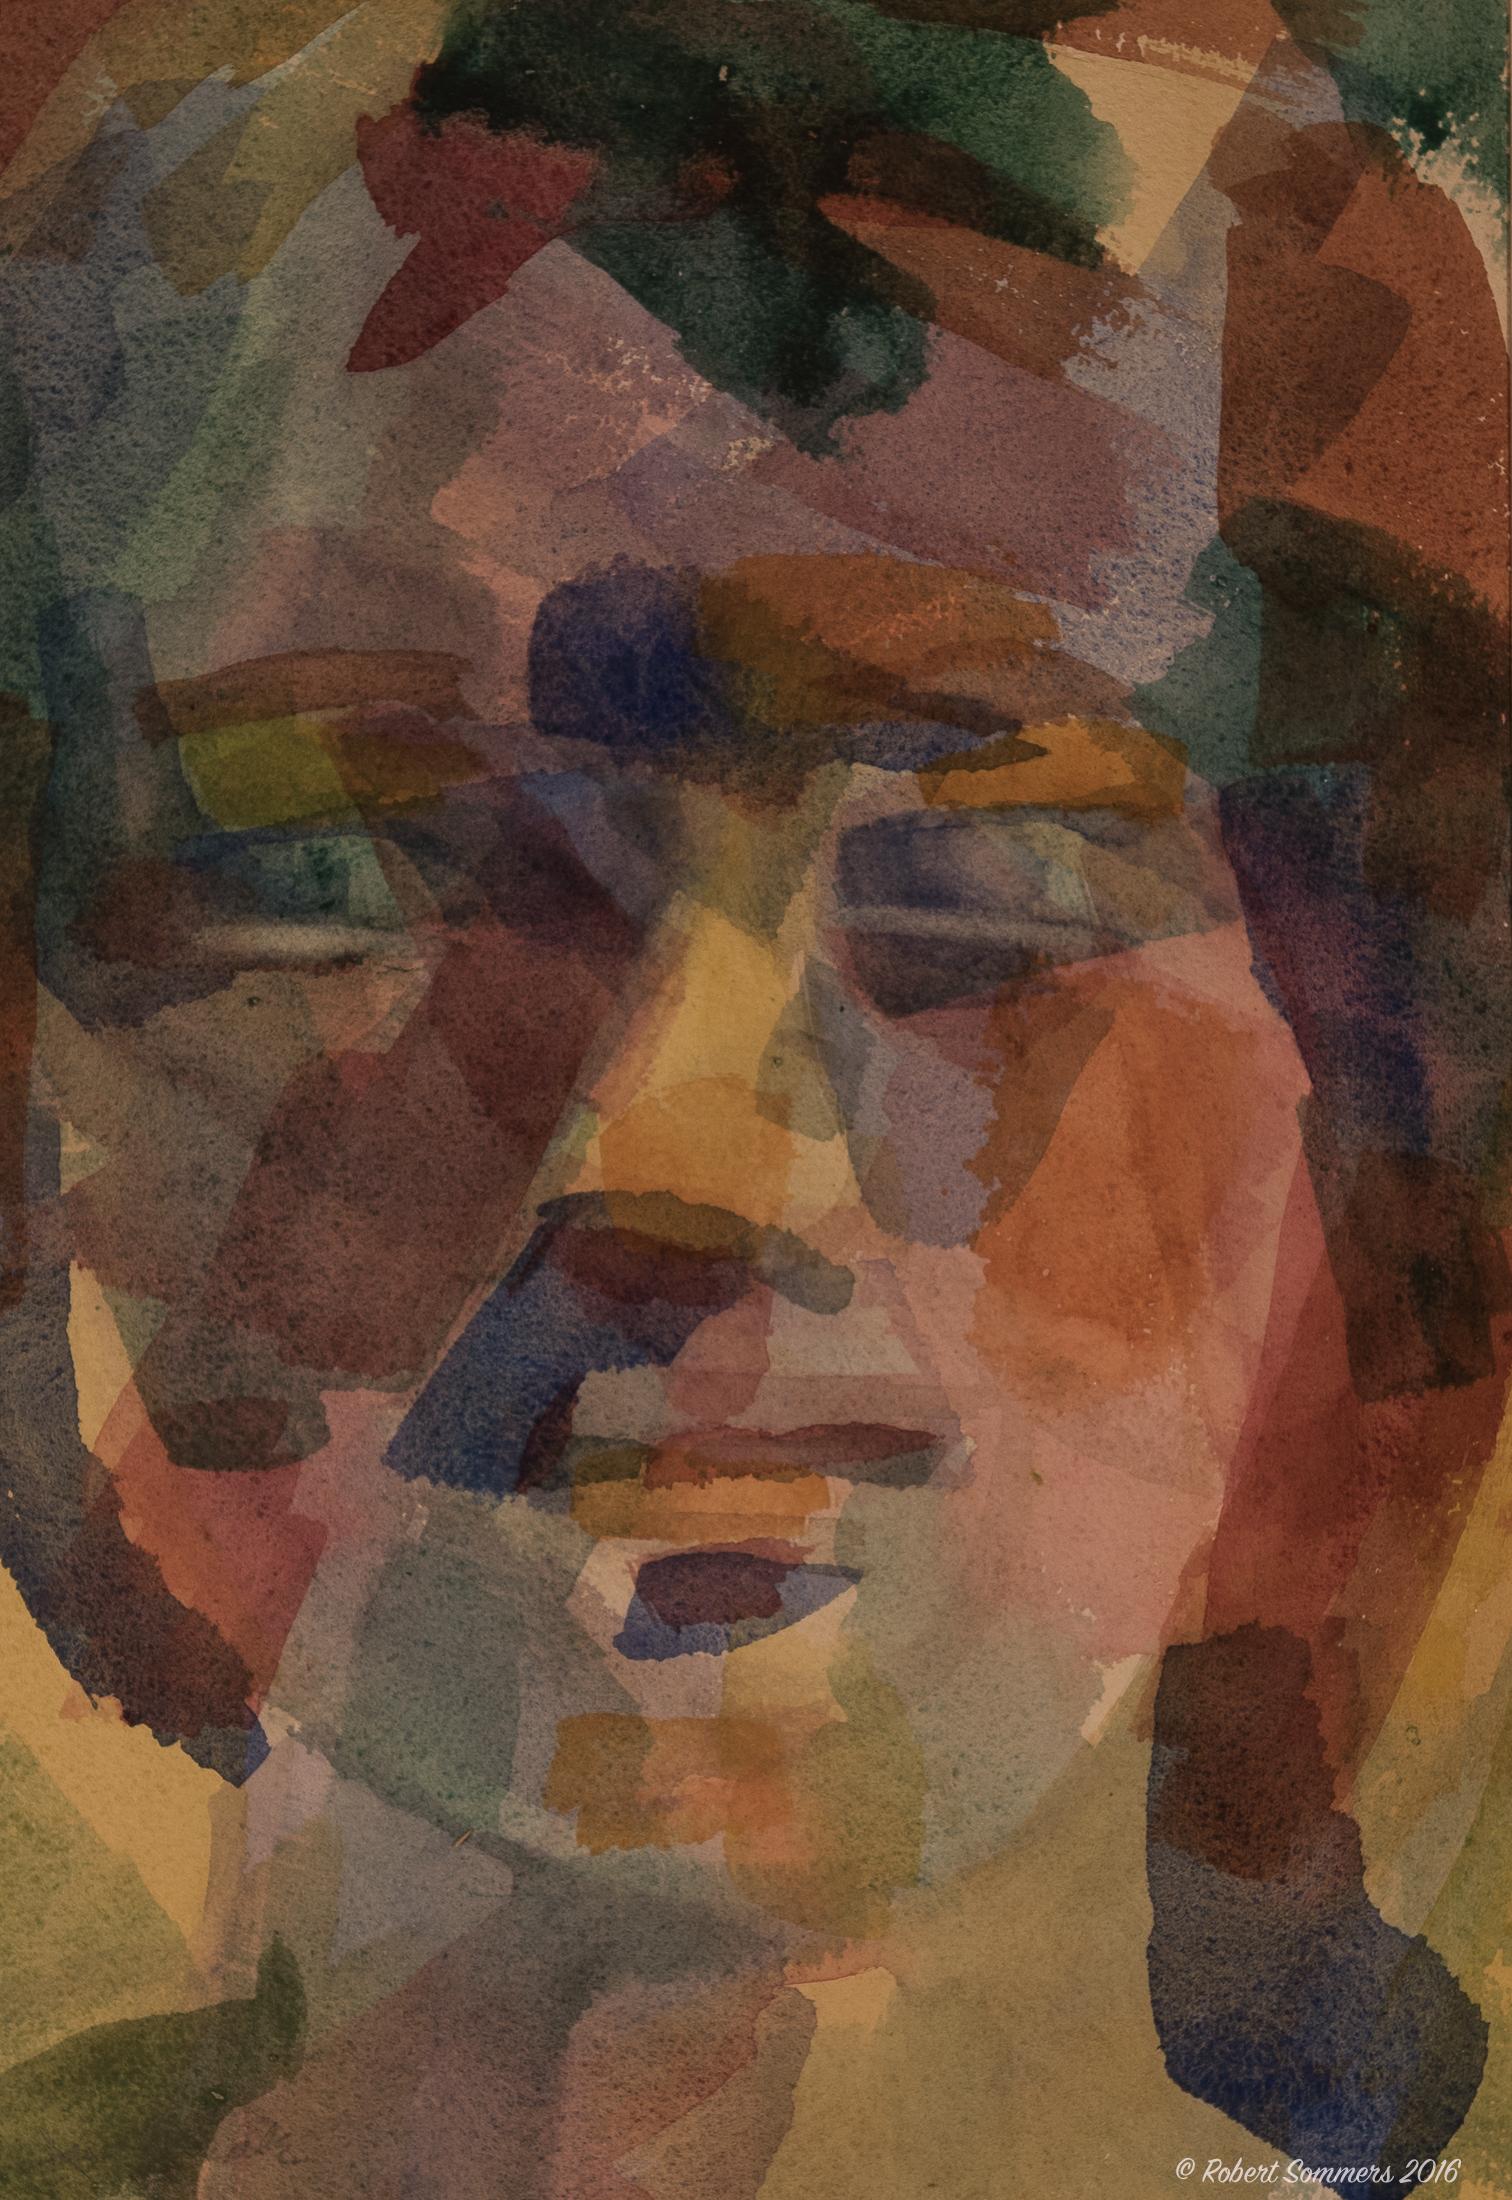 portrait (1 of 1)